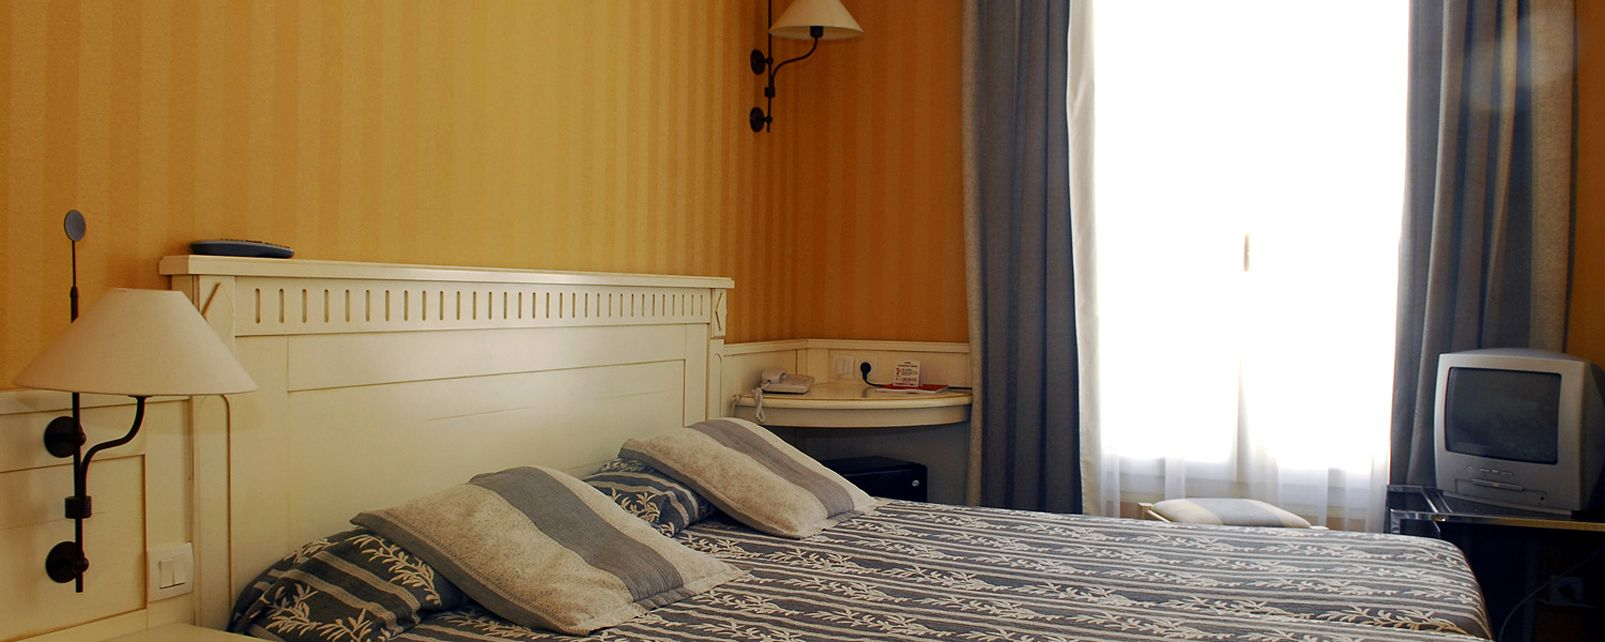 Hotel Exclusive Villa Opera Lamartine Paris